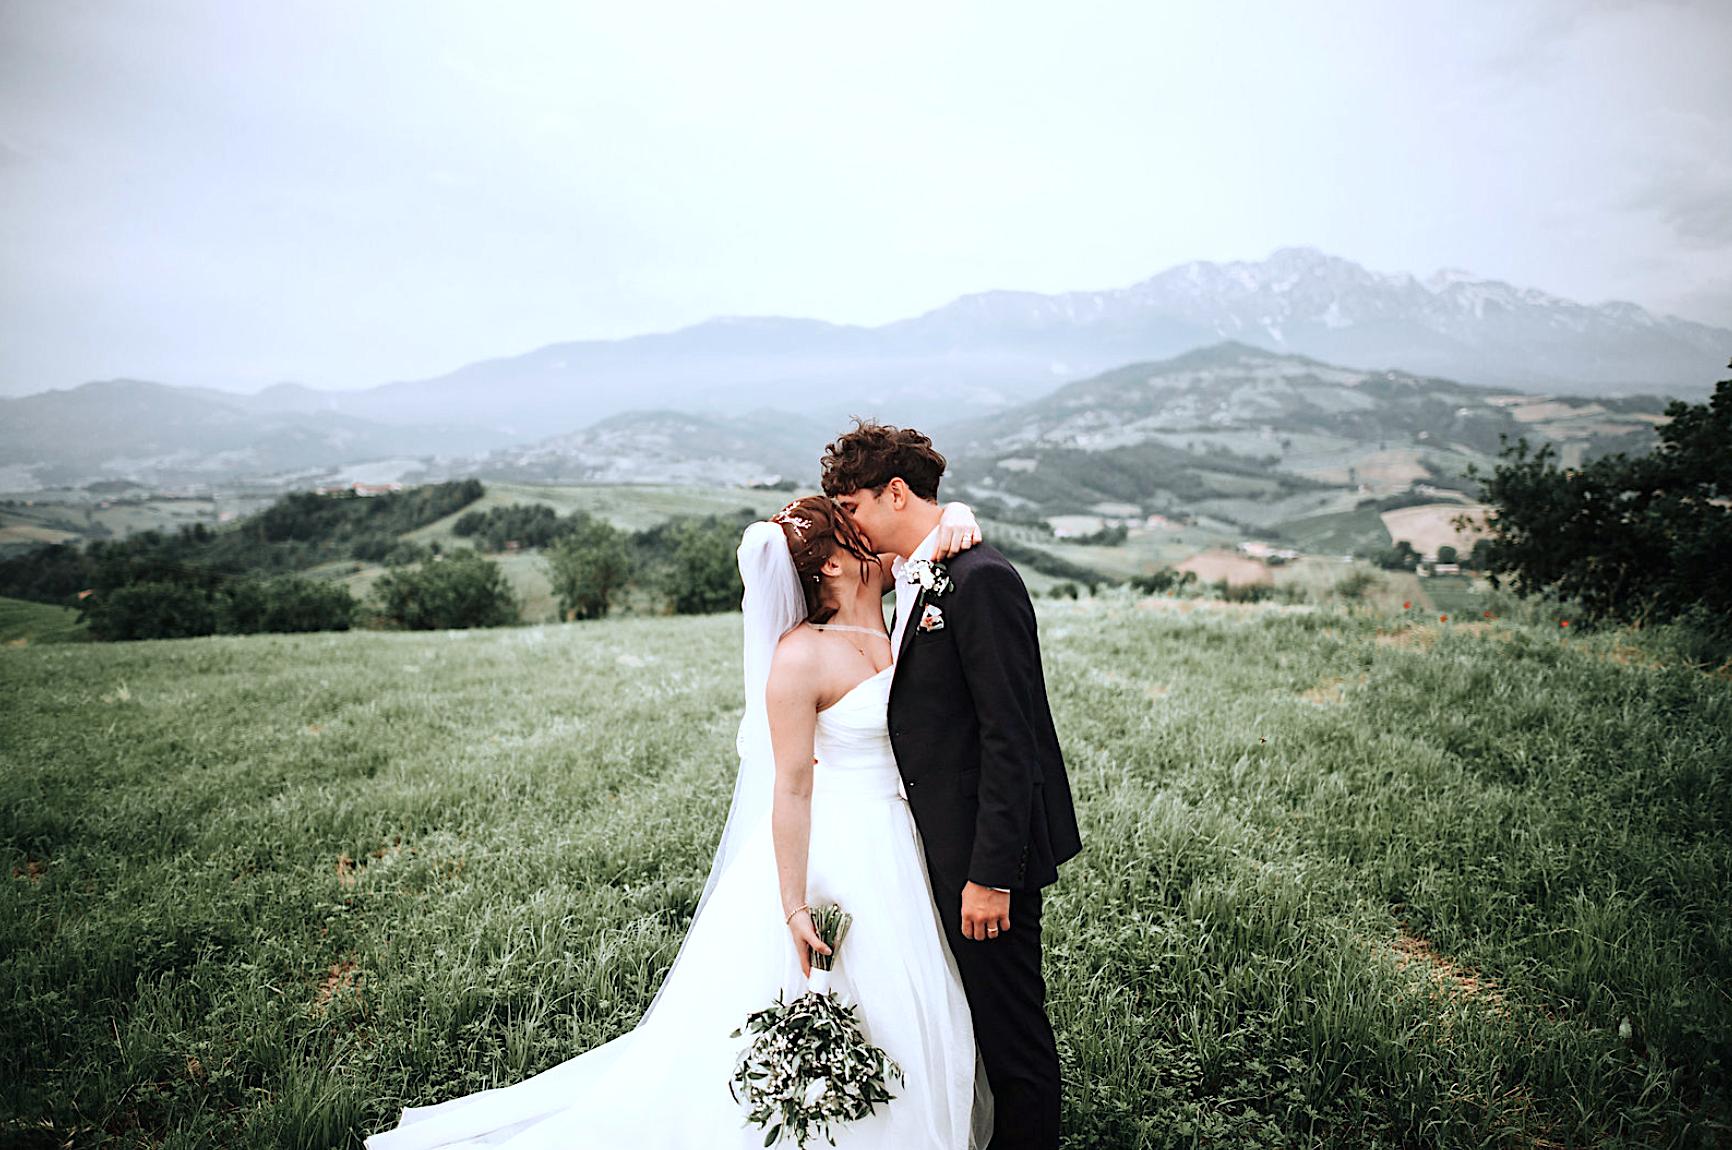 Sam + Emily | Abruzzo, Italy | Abruzzo